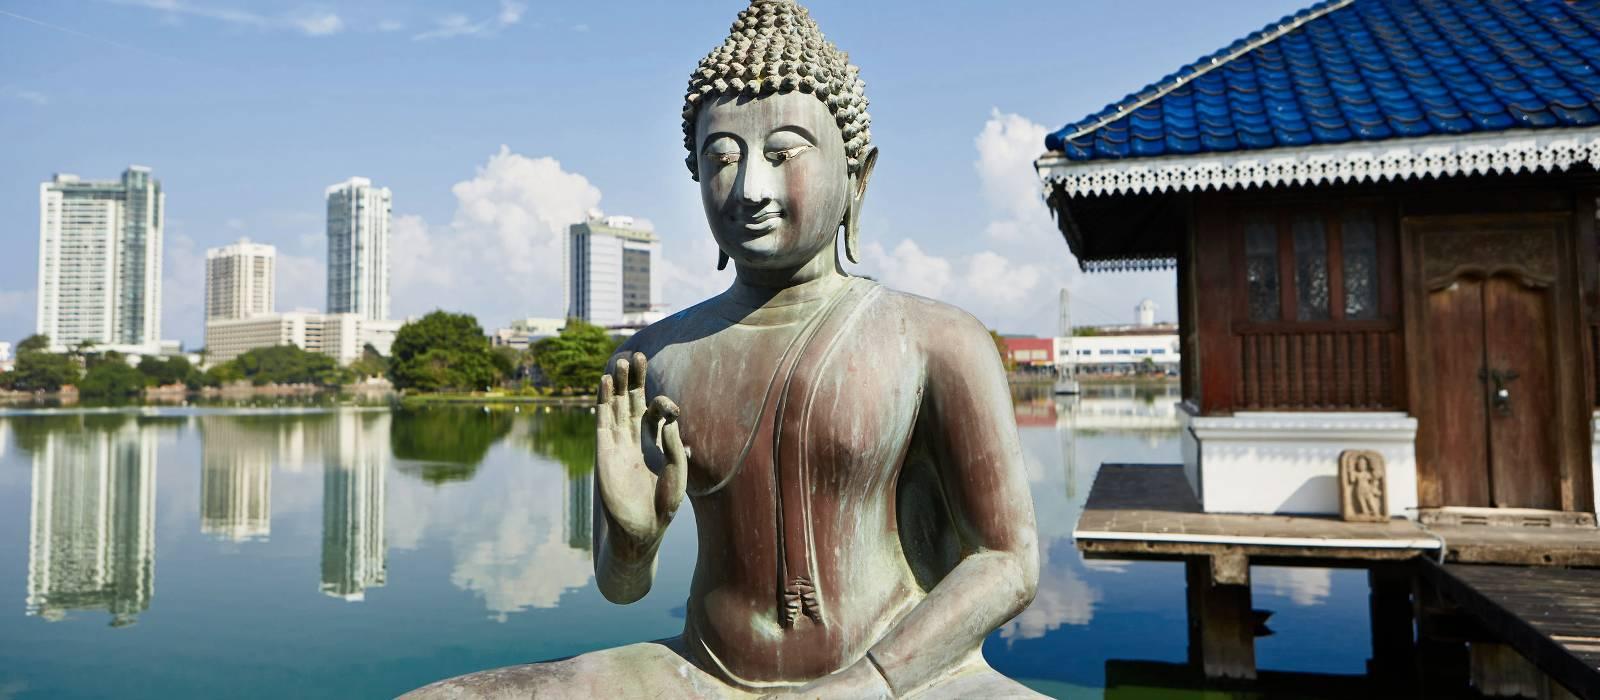 Signature of Sri Lanka Tour Trip 1